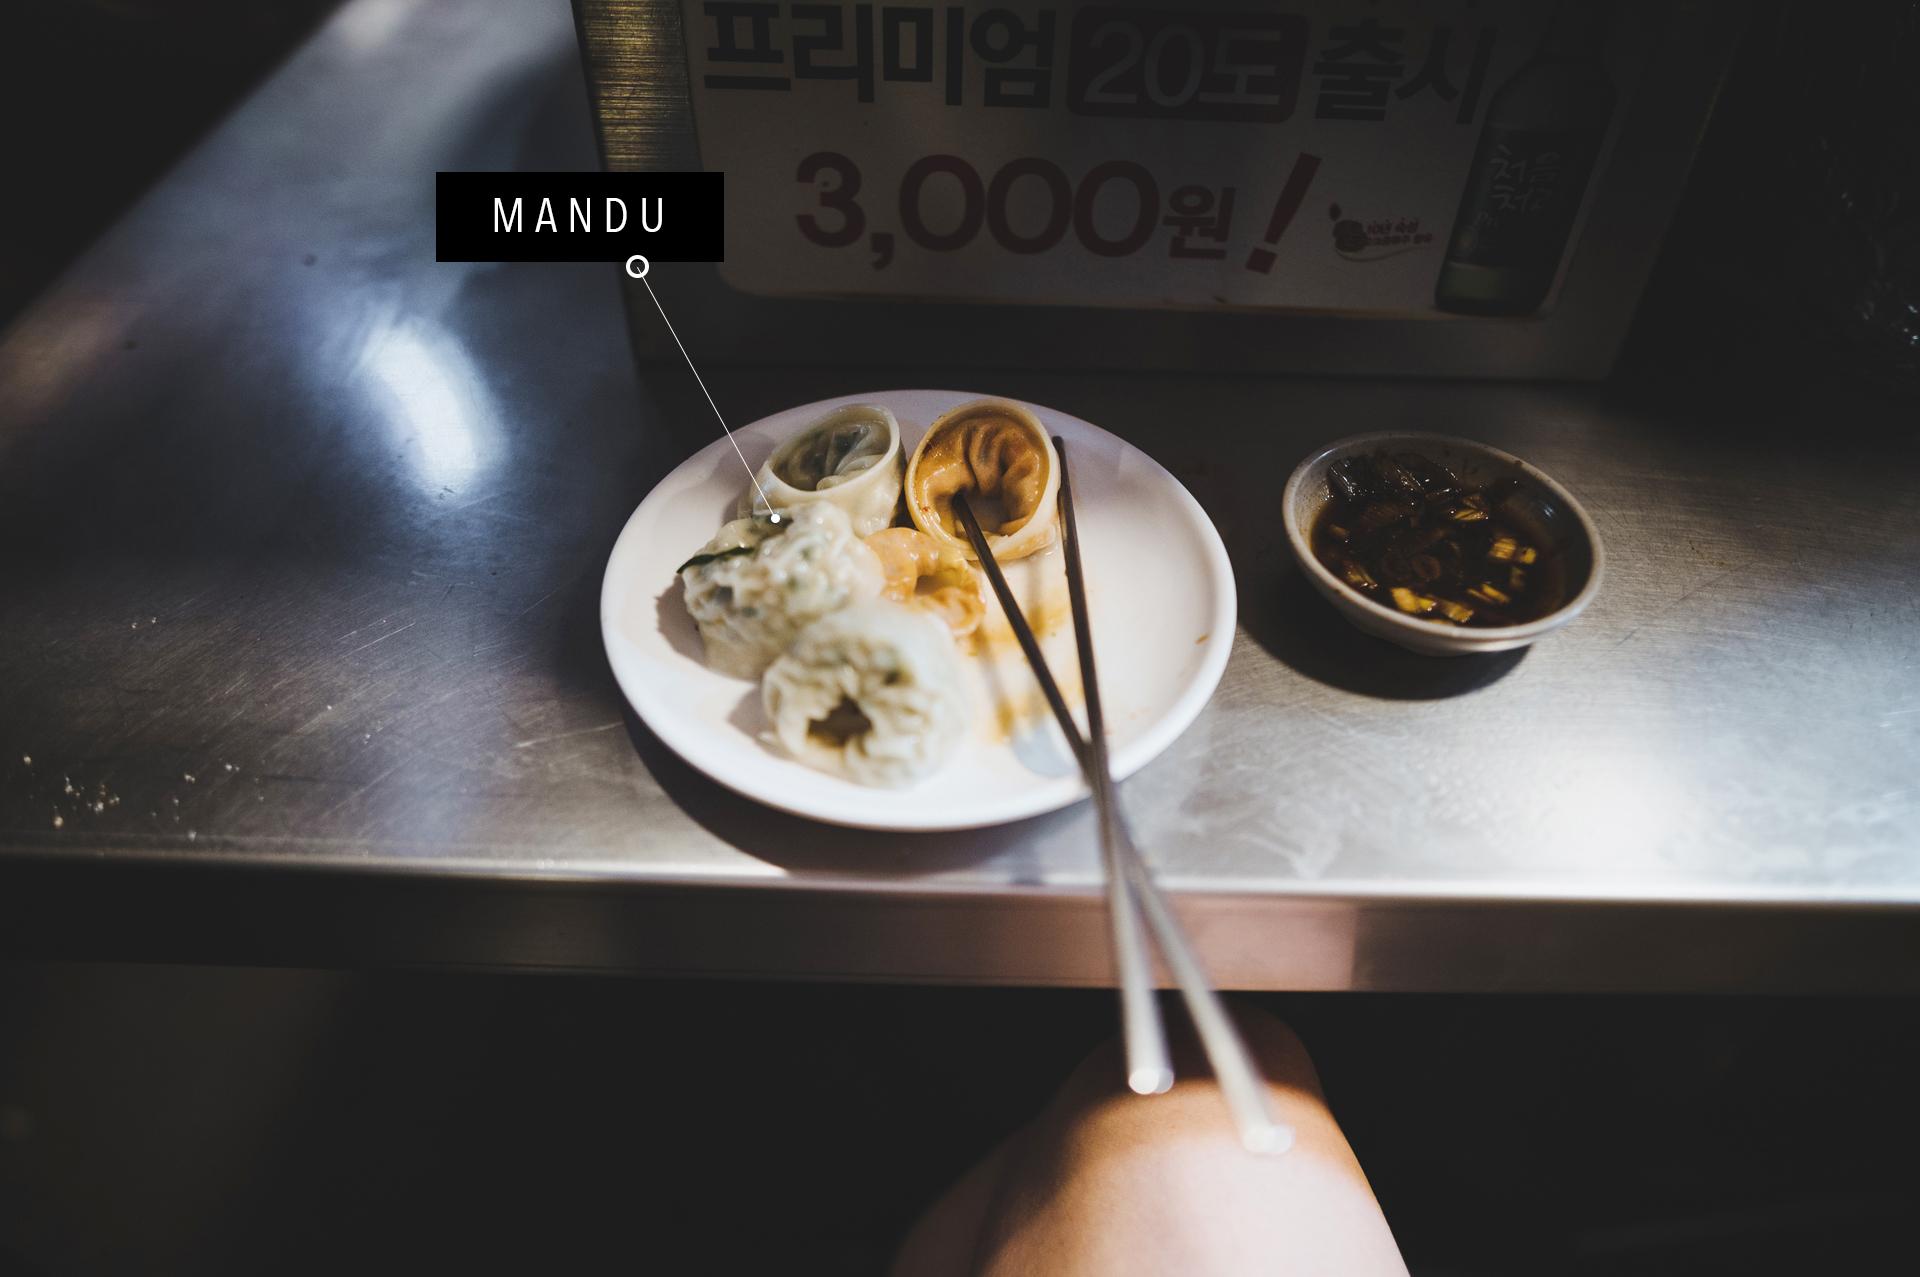 mandu kuchnia koreanska